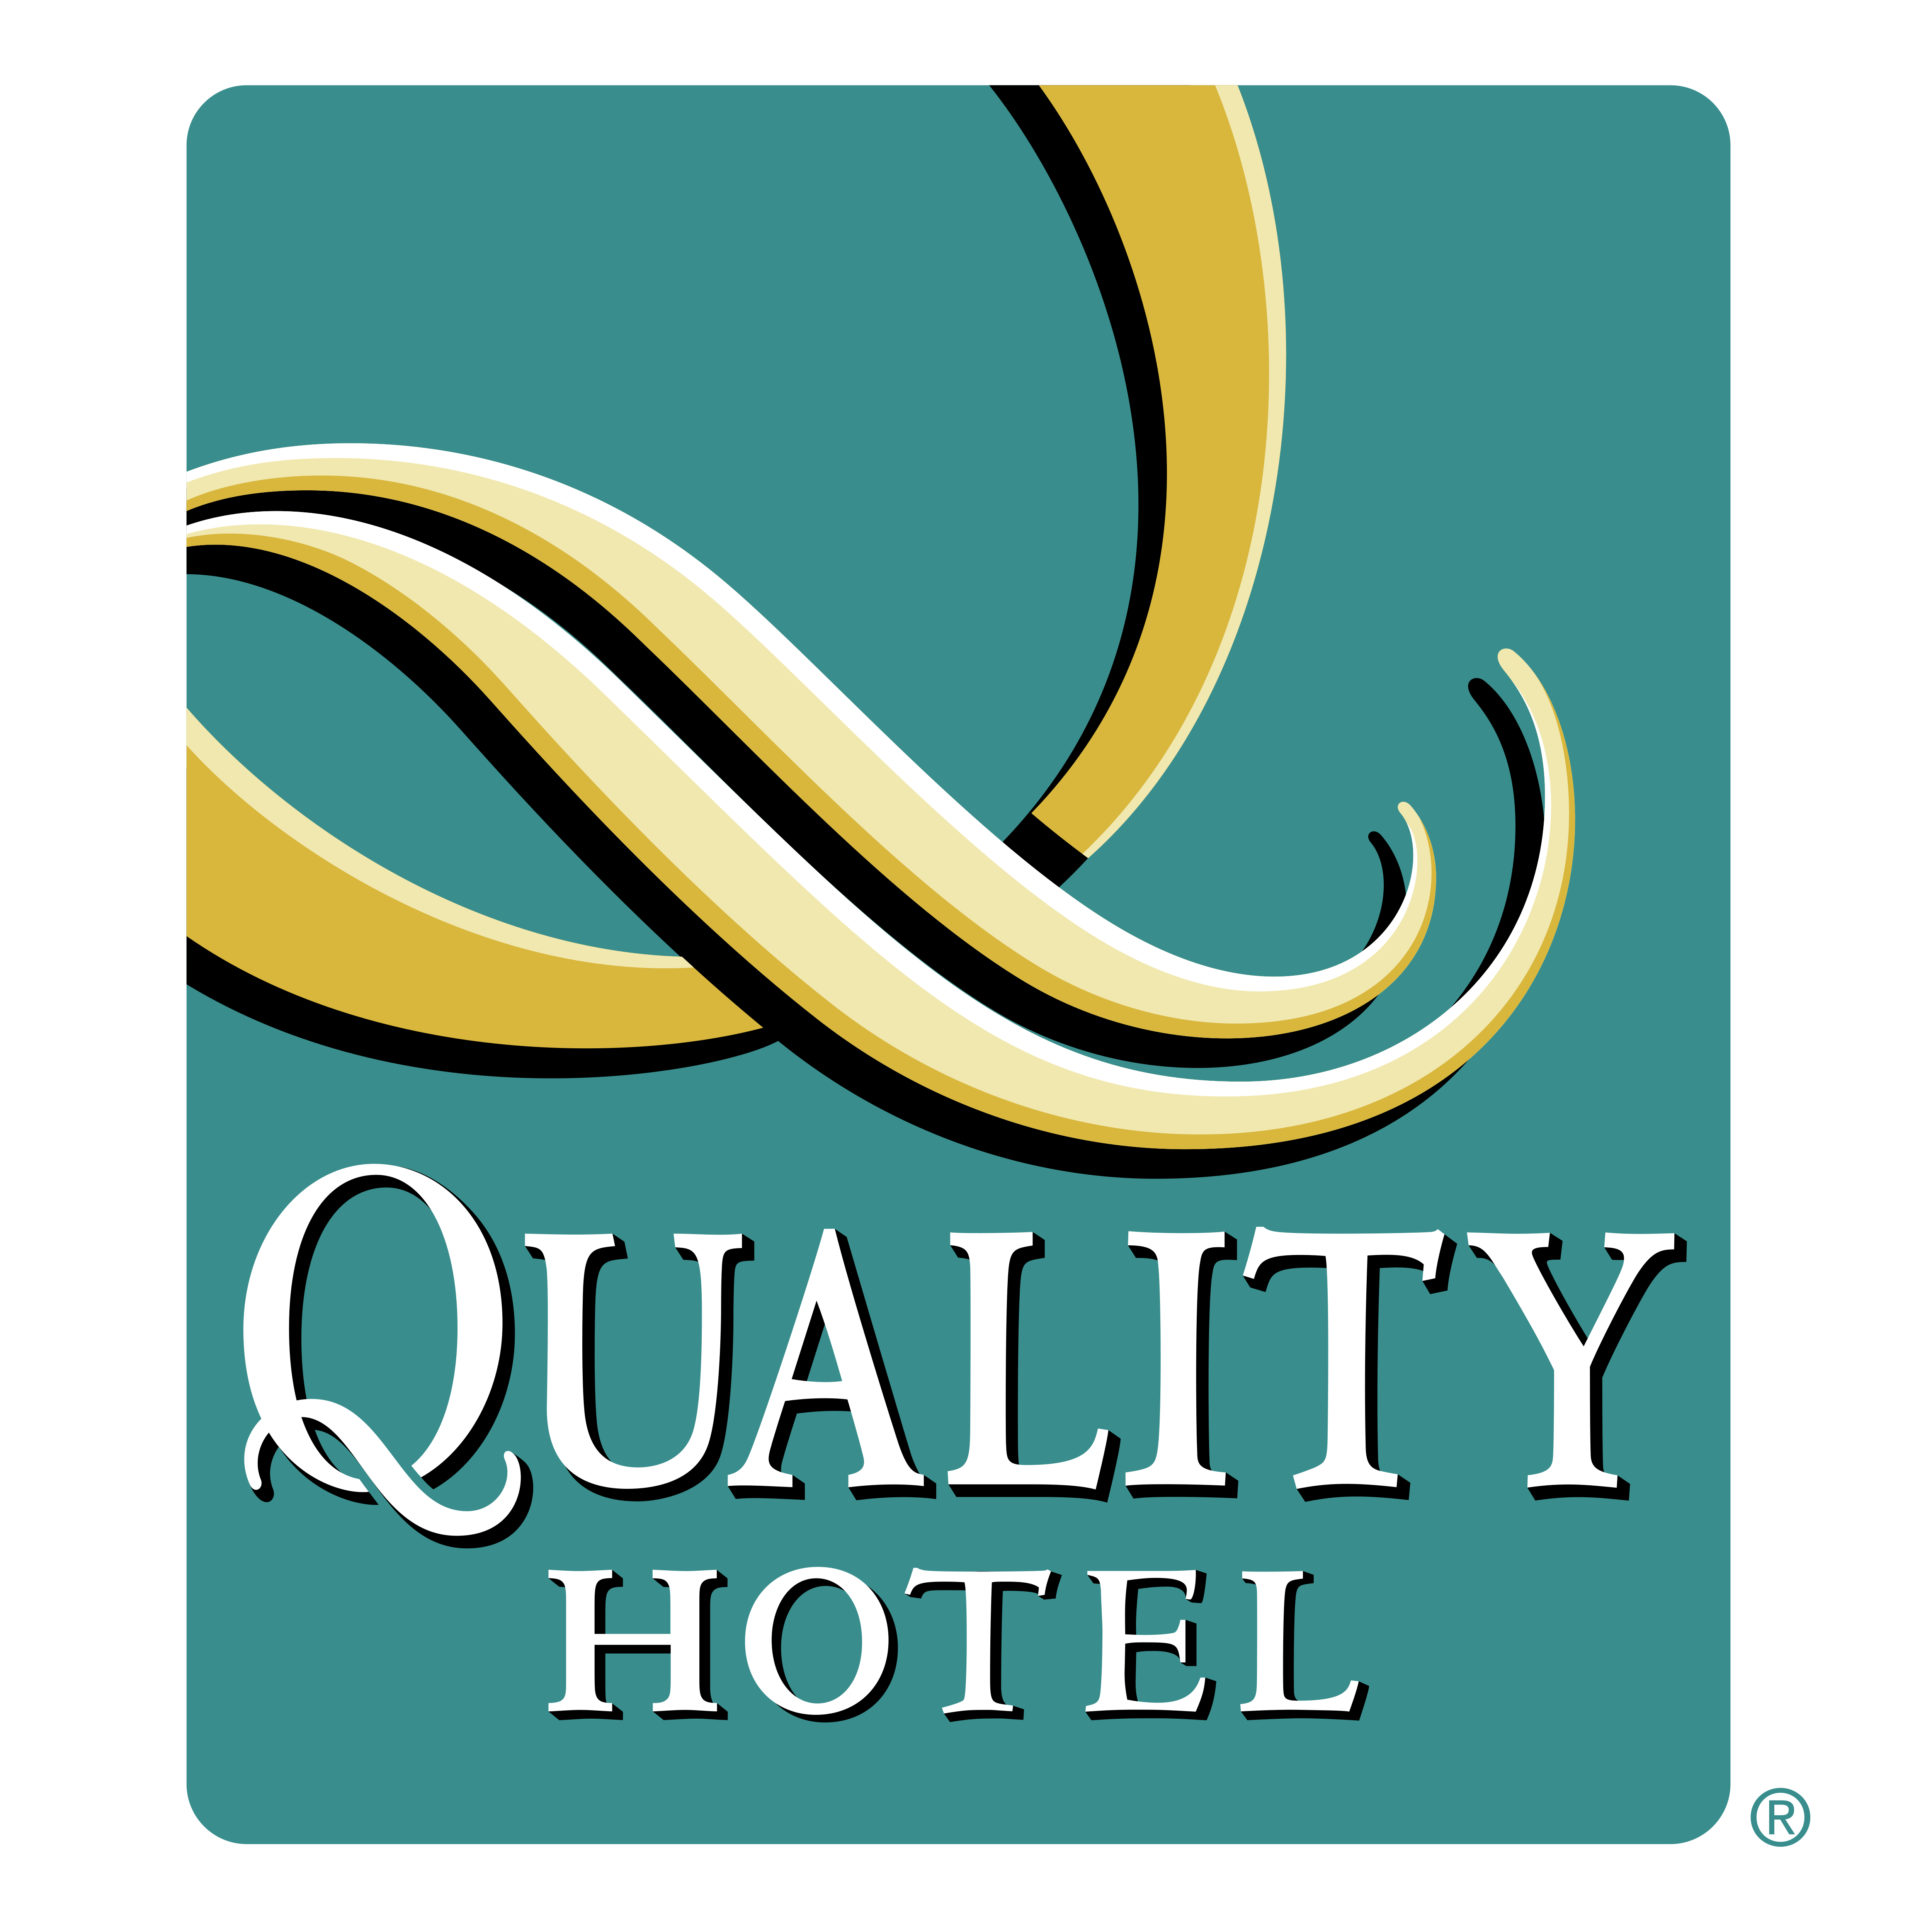 Quality Hotel  U2013 Logos Download